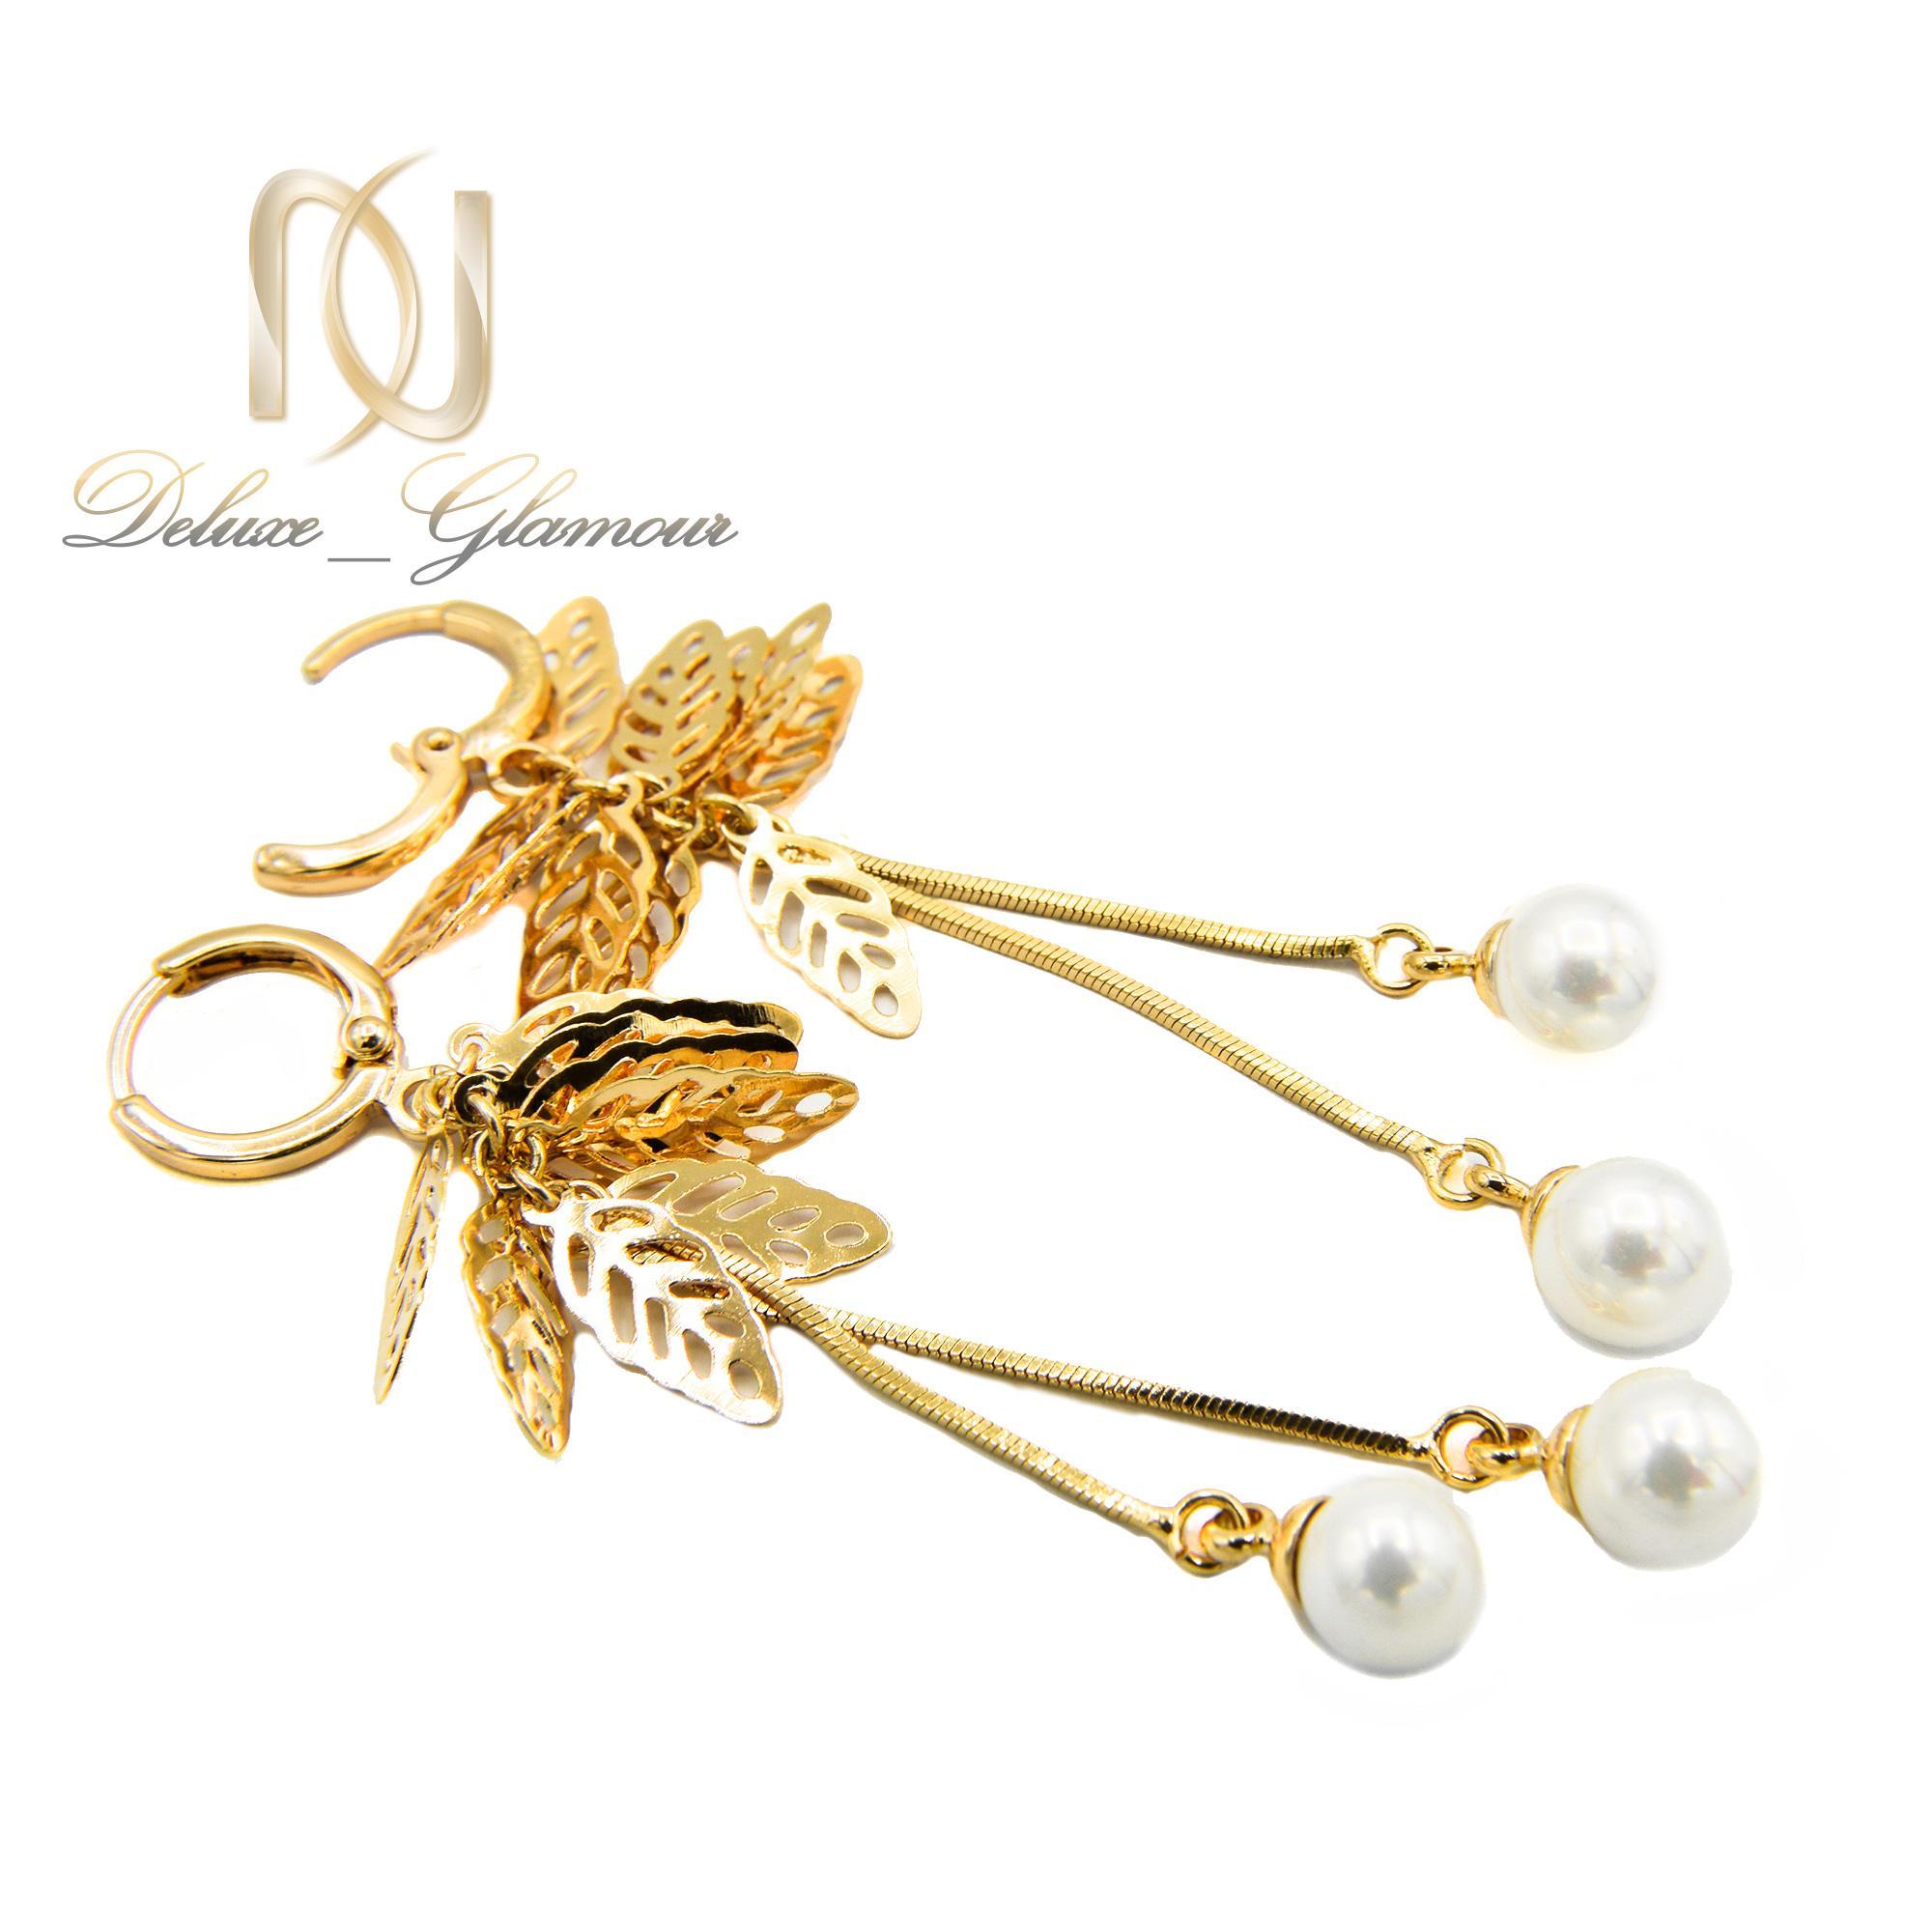 گوشواره زنانه آویزی ژوپینگ طرح طلا er-n173